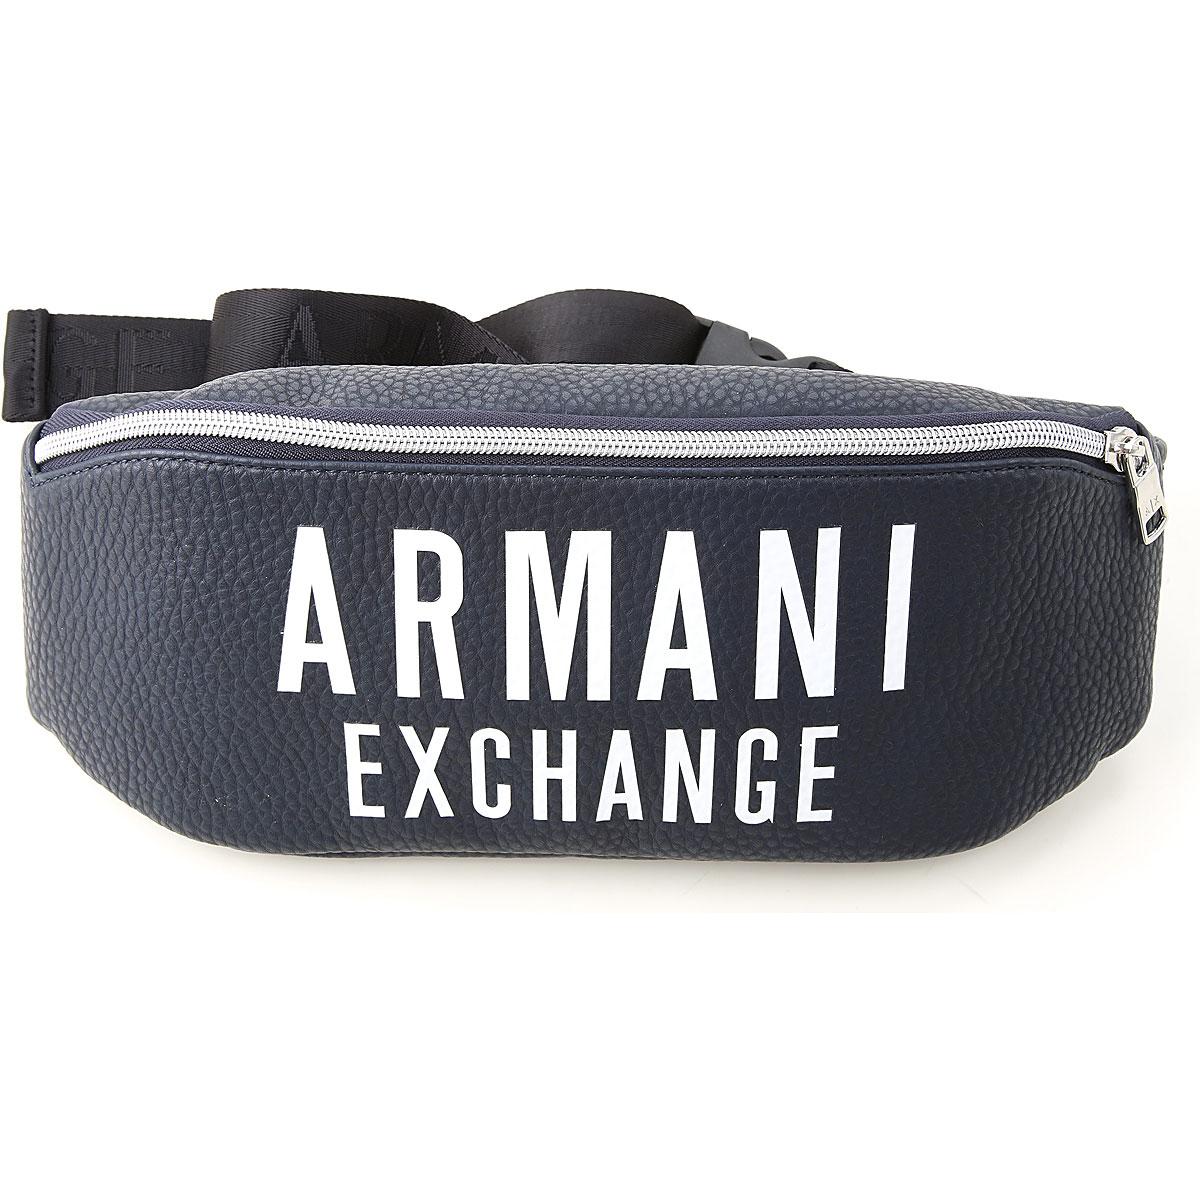 Armani Exchange Briefcases On Sale, Dark Blue, Eco Leather, 2019